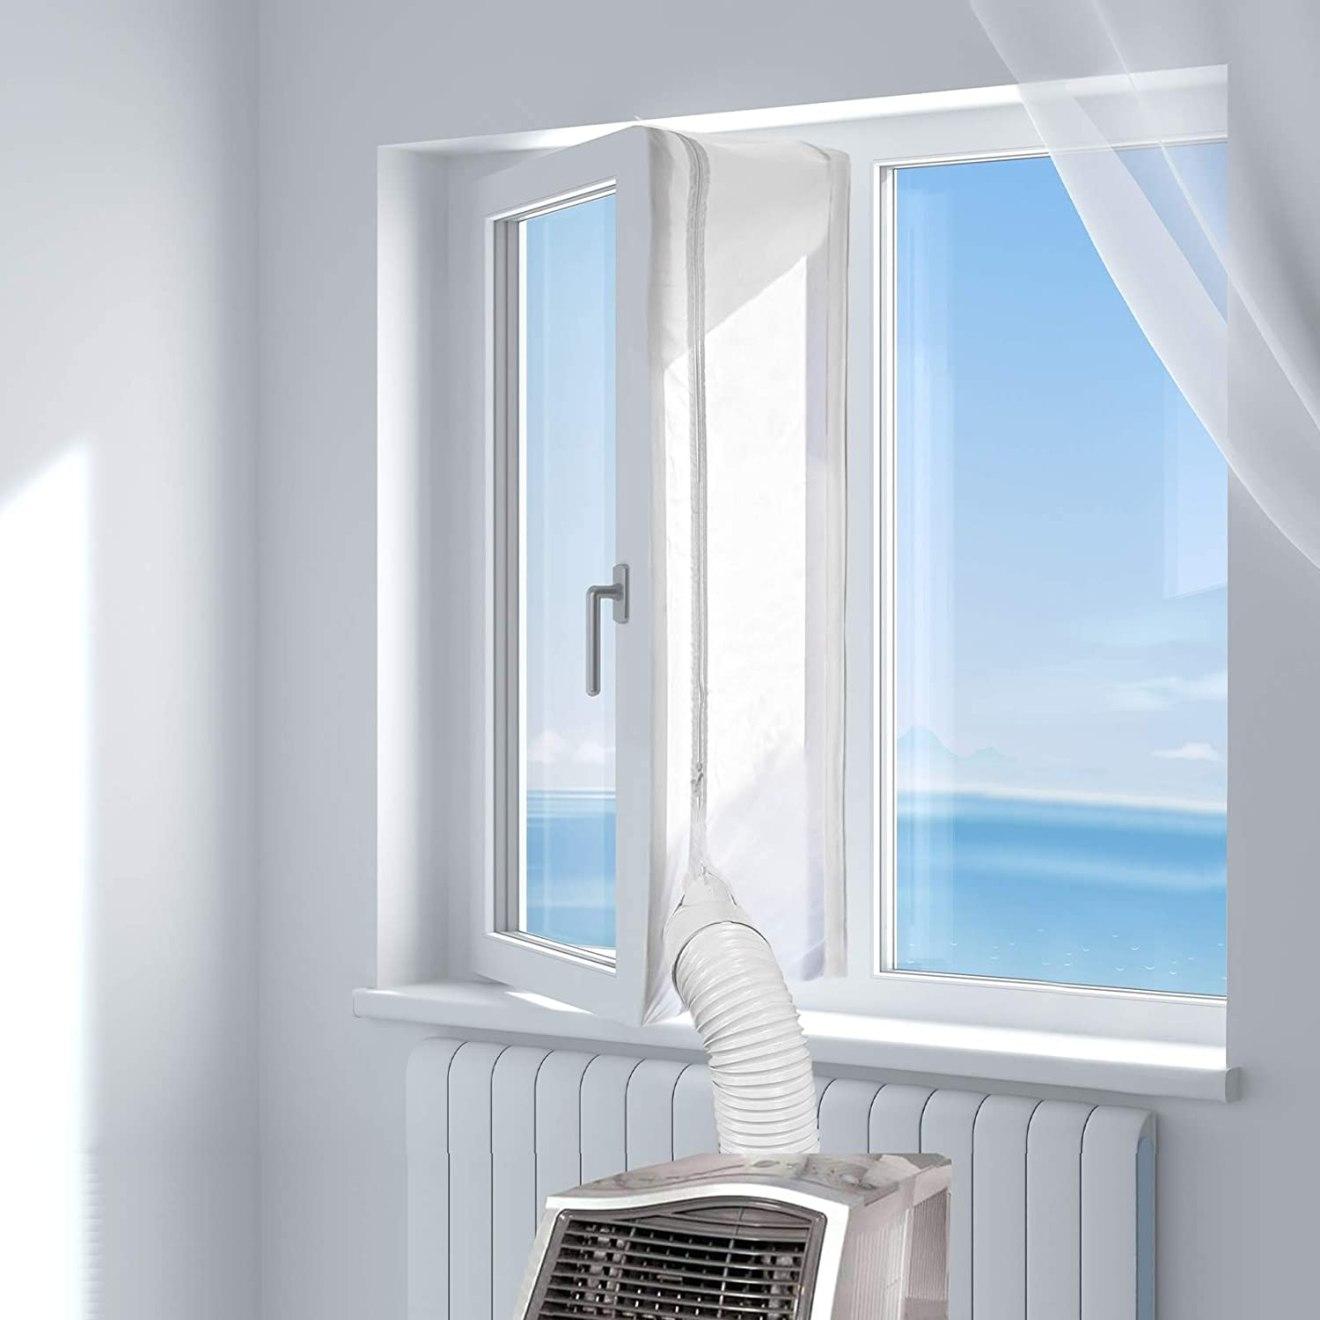 guaina finestra per clima portatile